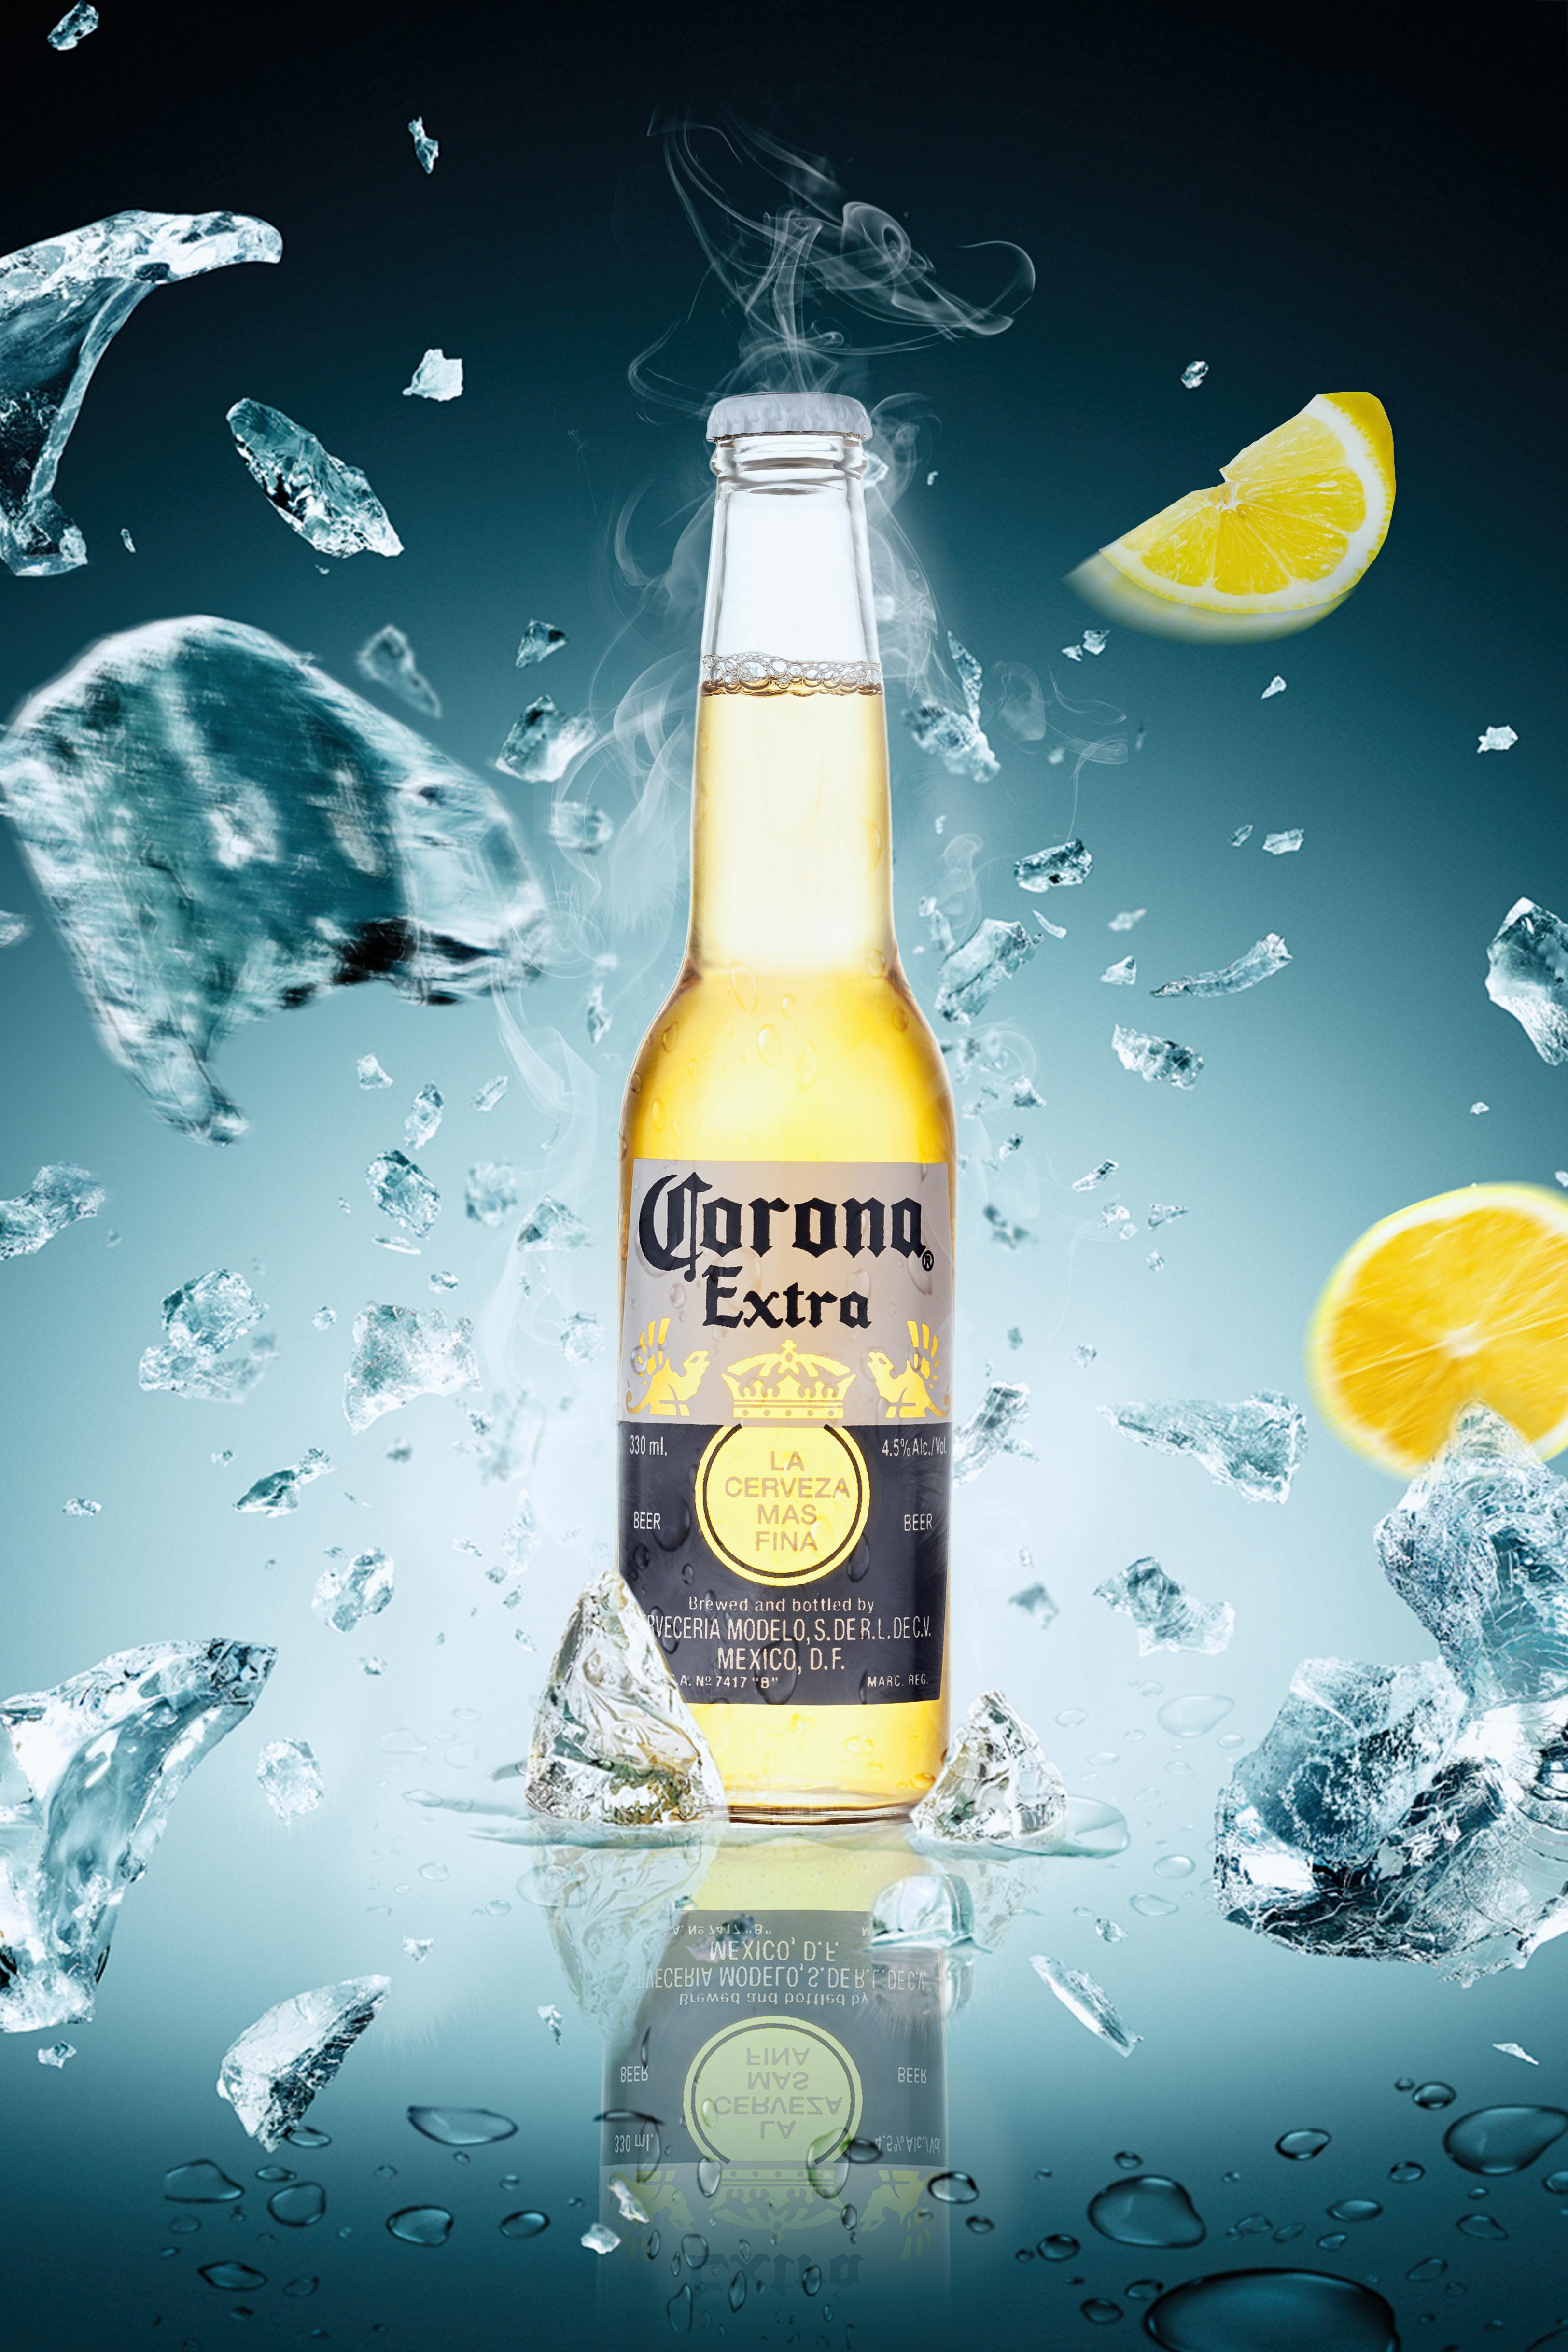 el verano de hielo cerveza la impresi u00f3n de fondo verano